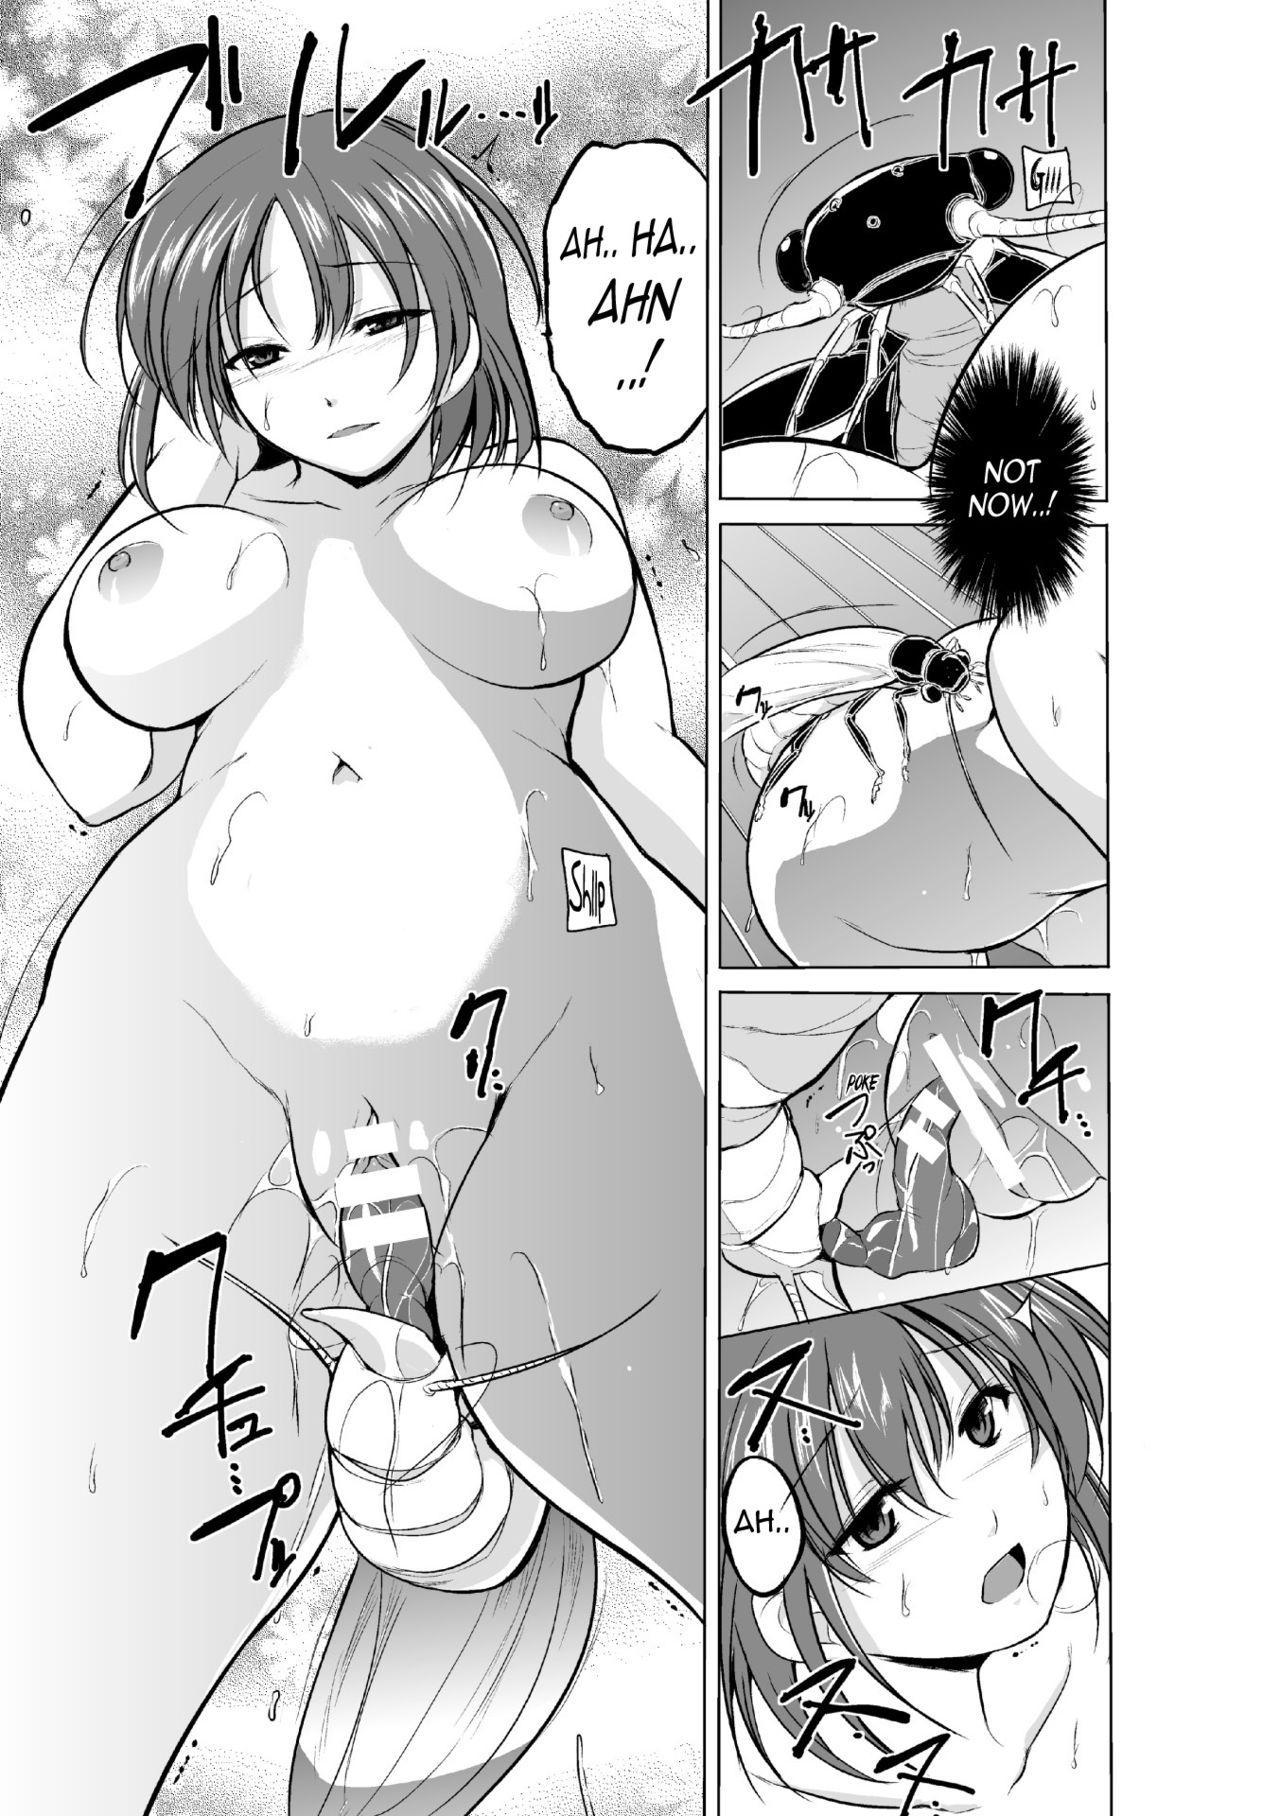 [Chiba Tetsutarou] Mushi Yuugi  -Mant - ENG 56